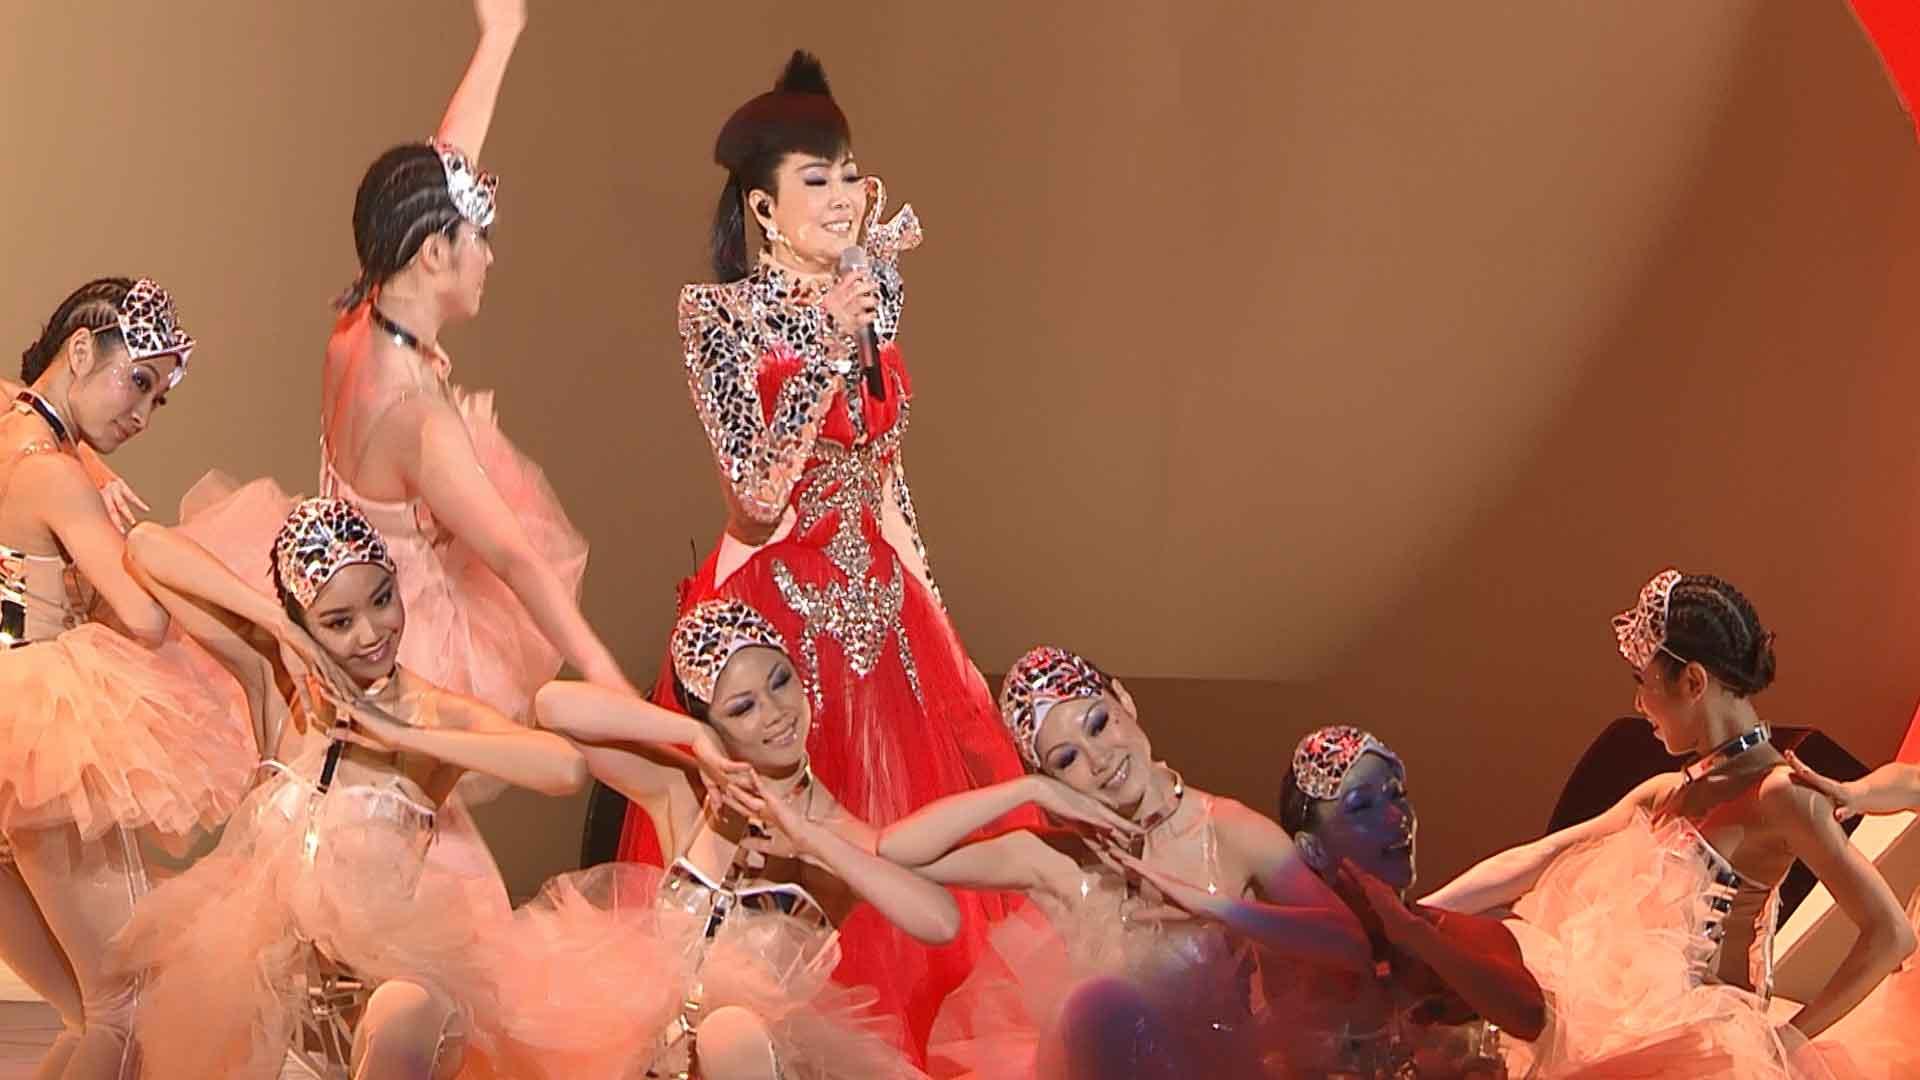 [蓝光原盘] 江蕙 镜花水月 Jody Chiang 2013 Concert Live Karaoke 演唱会《ISO 44.03G》